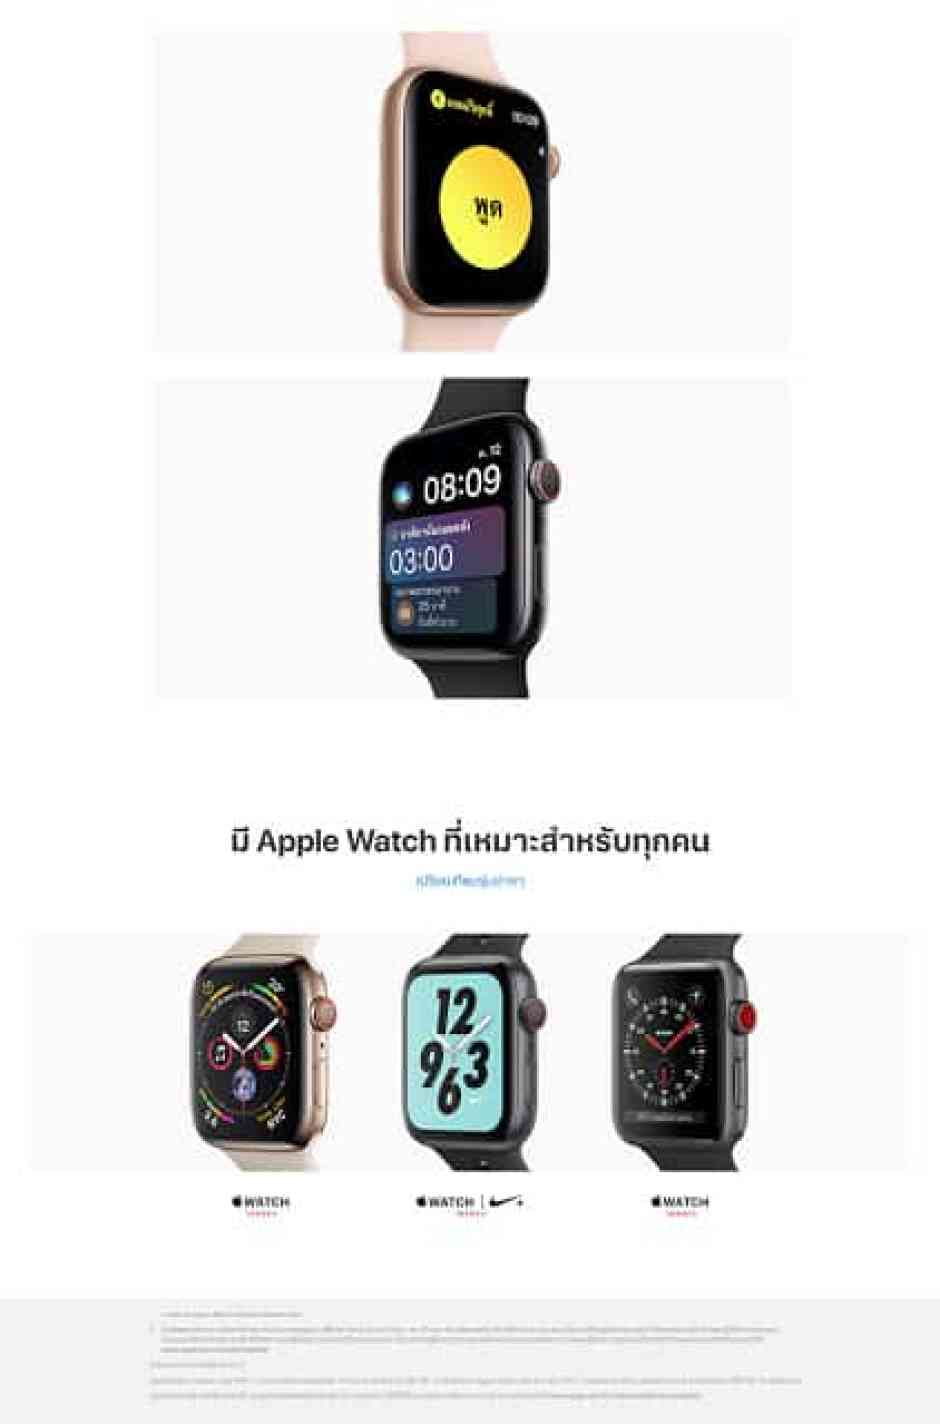 - 05 4 - Truemove H เตรียมวางจำหน่าย Apple Watch Series 4 รุ่นเซลลูลาร์ ในวันศุกร์ที่ 2 พฤศจิกายนนี้